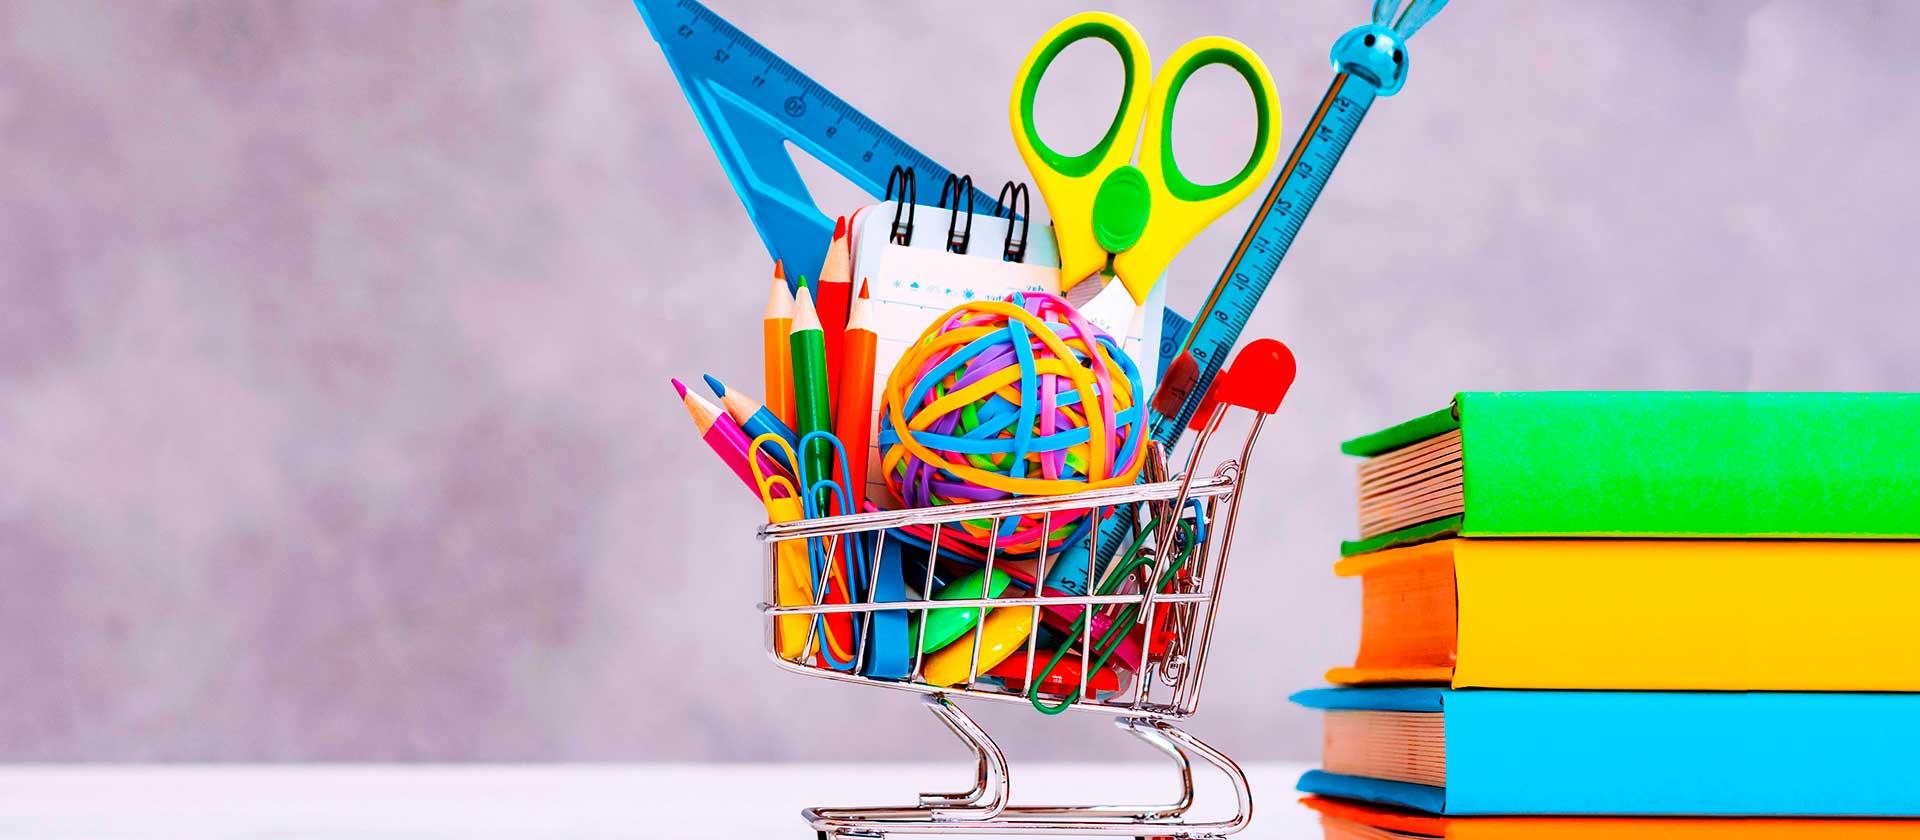 ahorrar en compra de útiles escolares